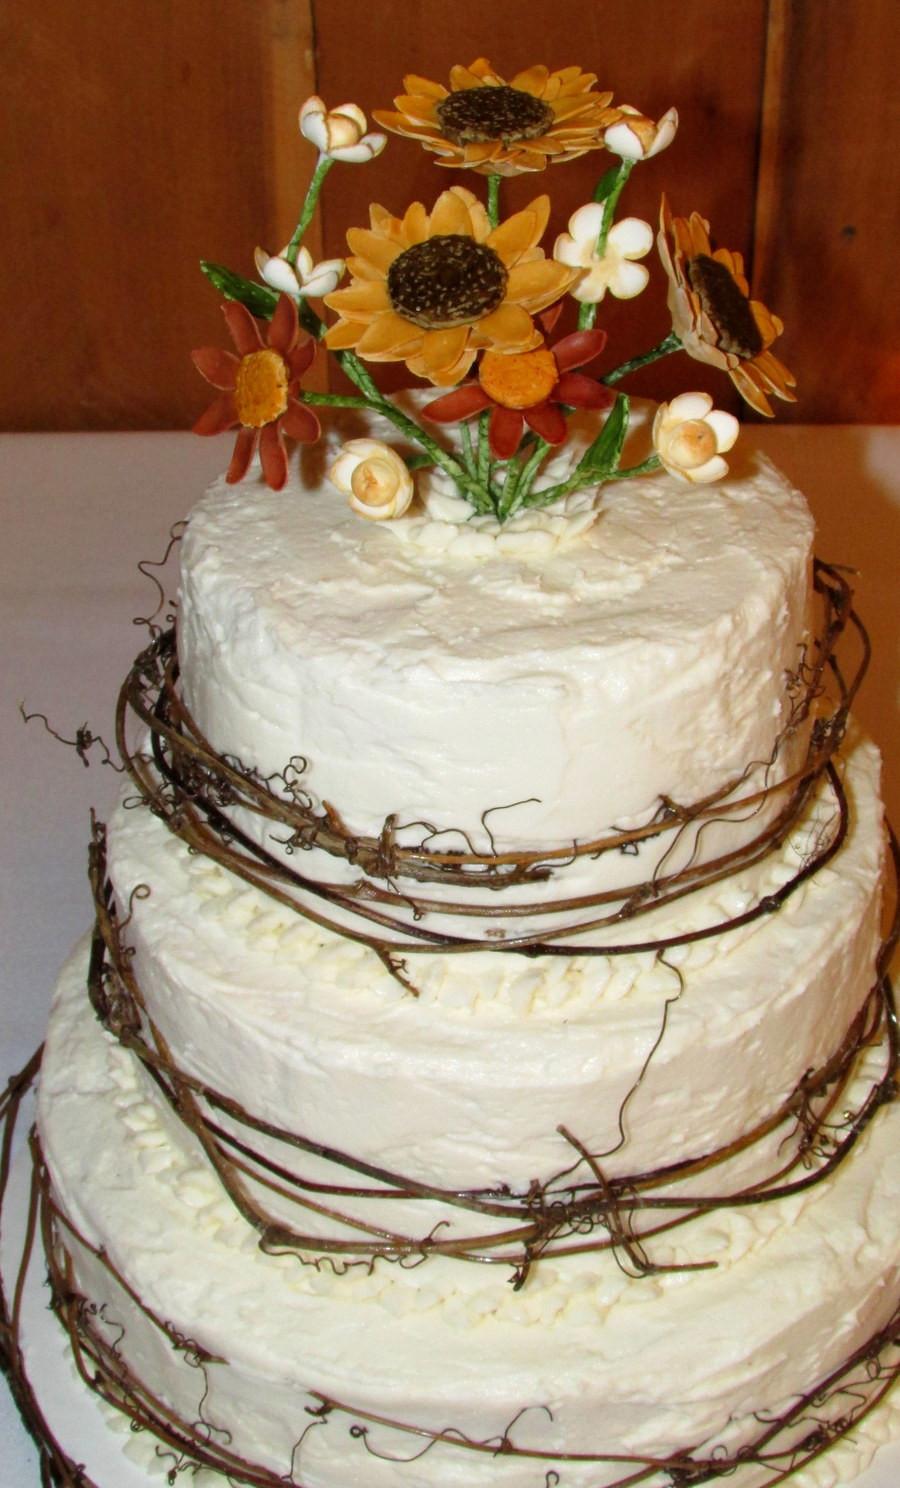 Summer Wedding Cakes  Rustic Summer Wedding Cake CakeCentral